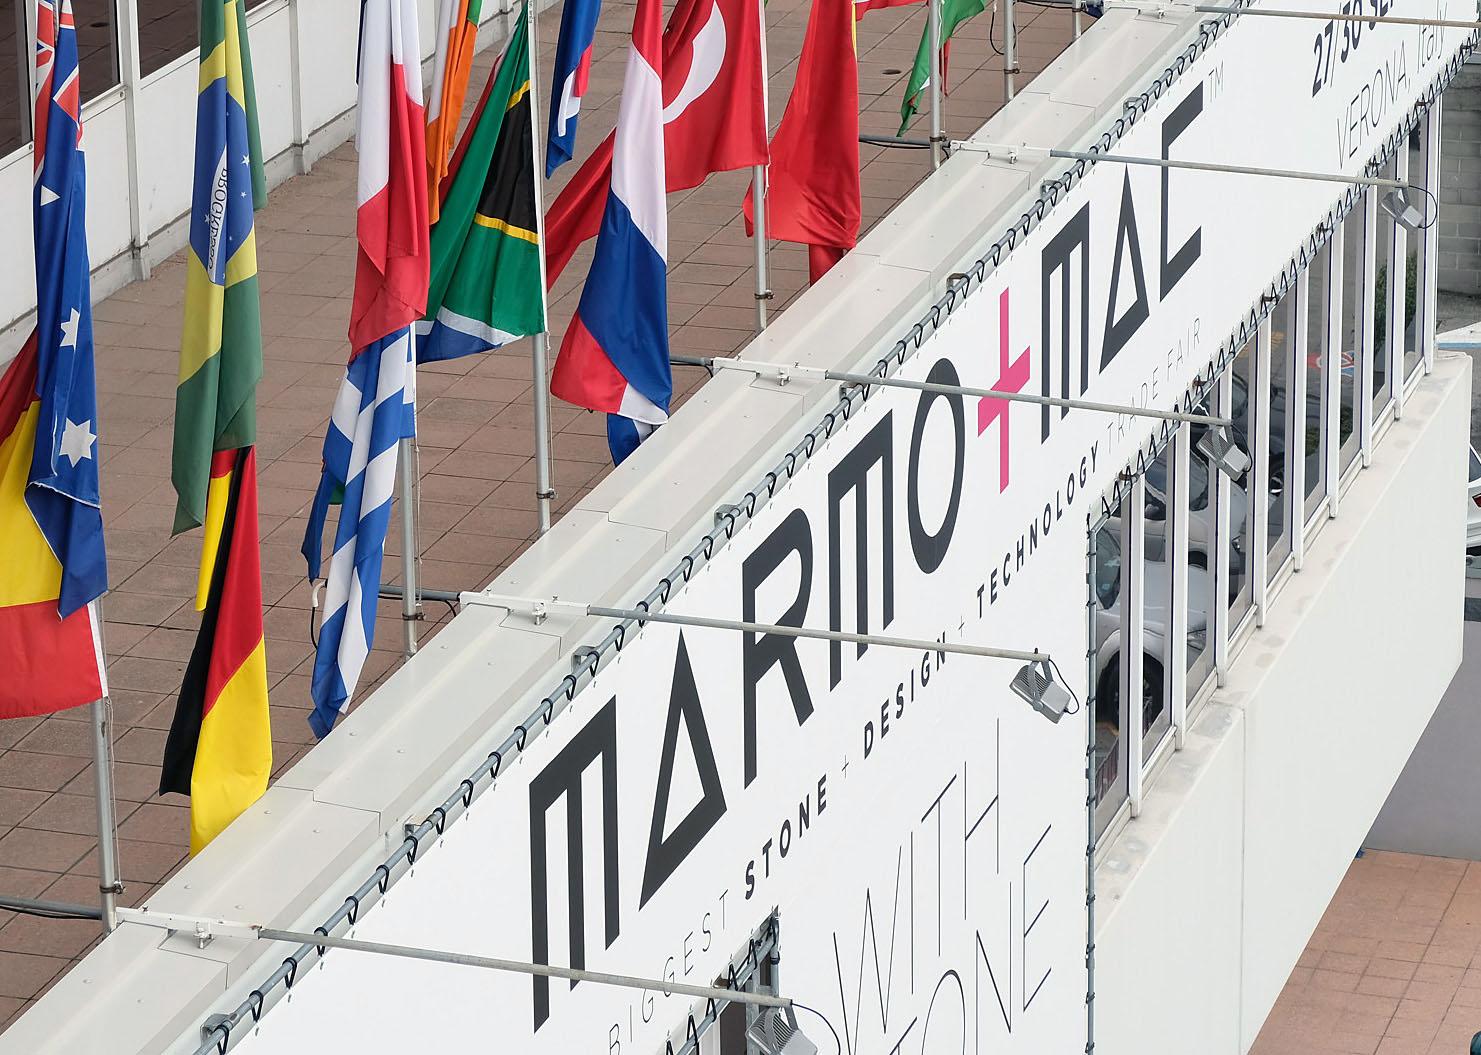 In crescita l'edizione 2017 di Marmomac -  -Attualità Notizie - MC5.0-Macchine Cantieri 3